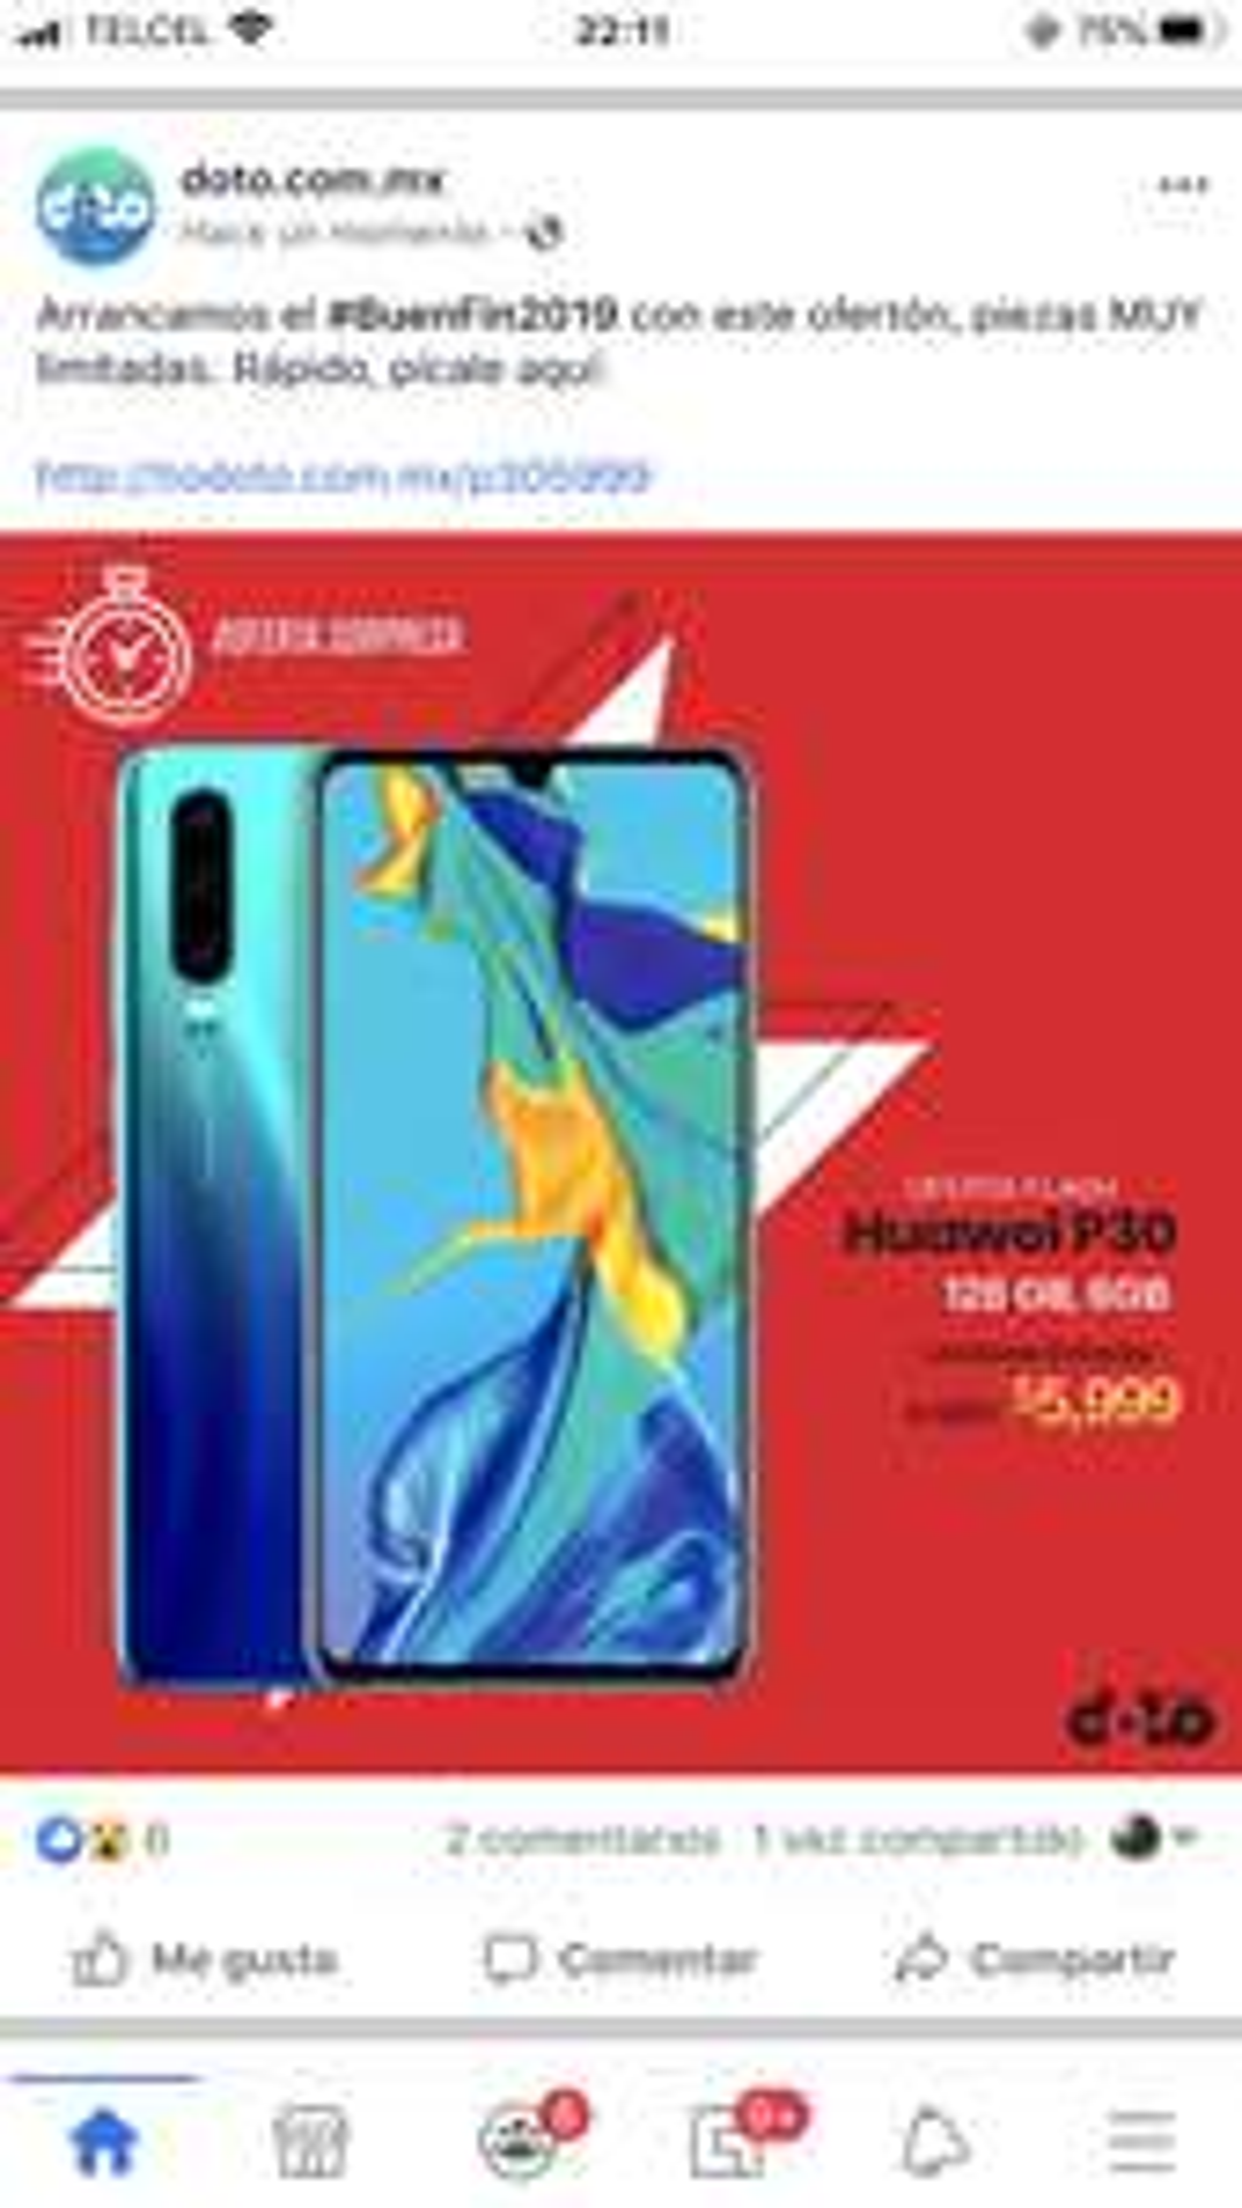 Doto: Huawei P30